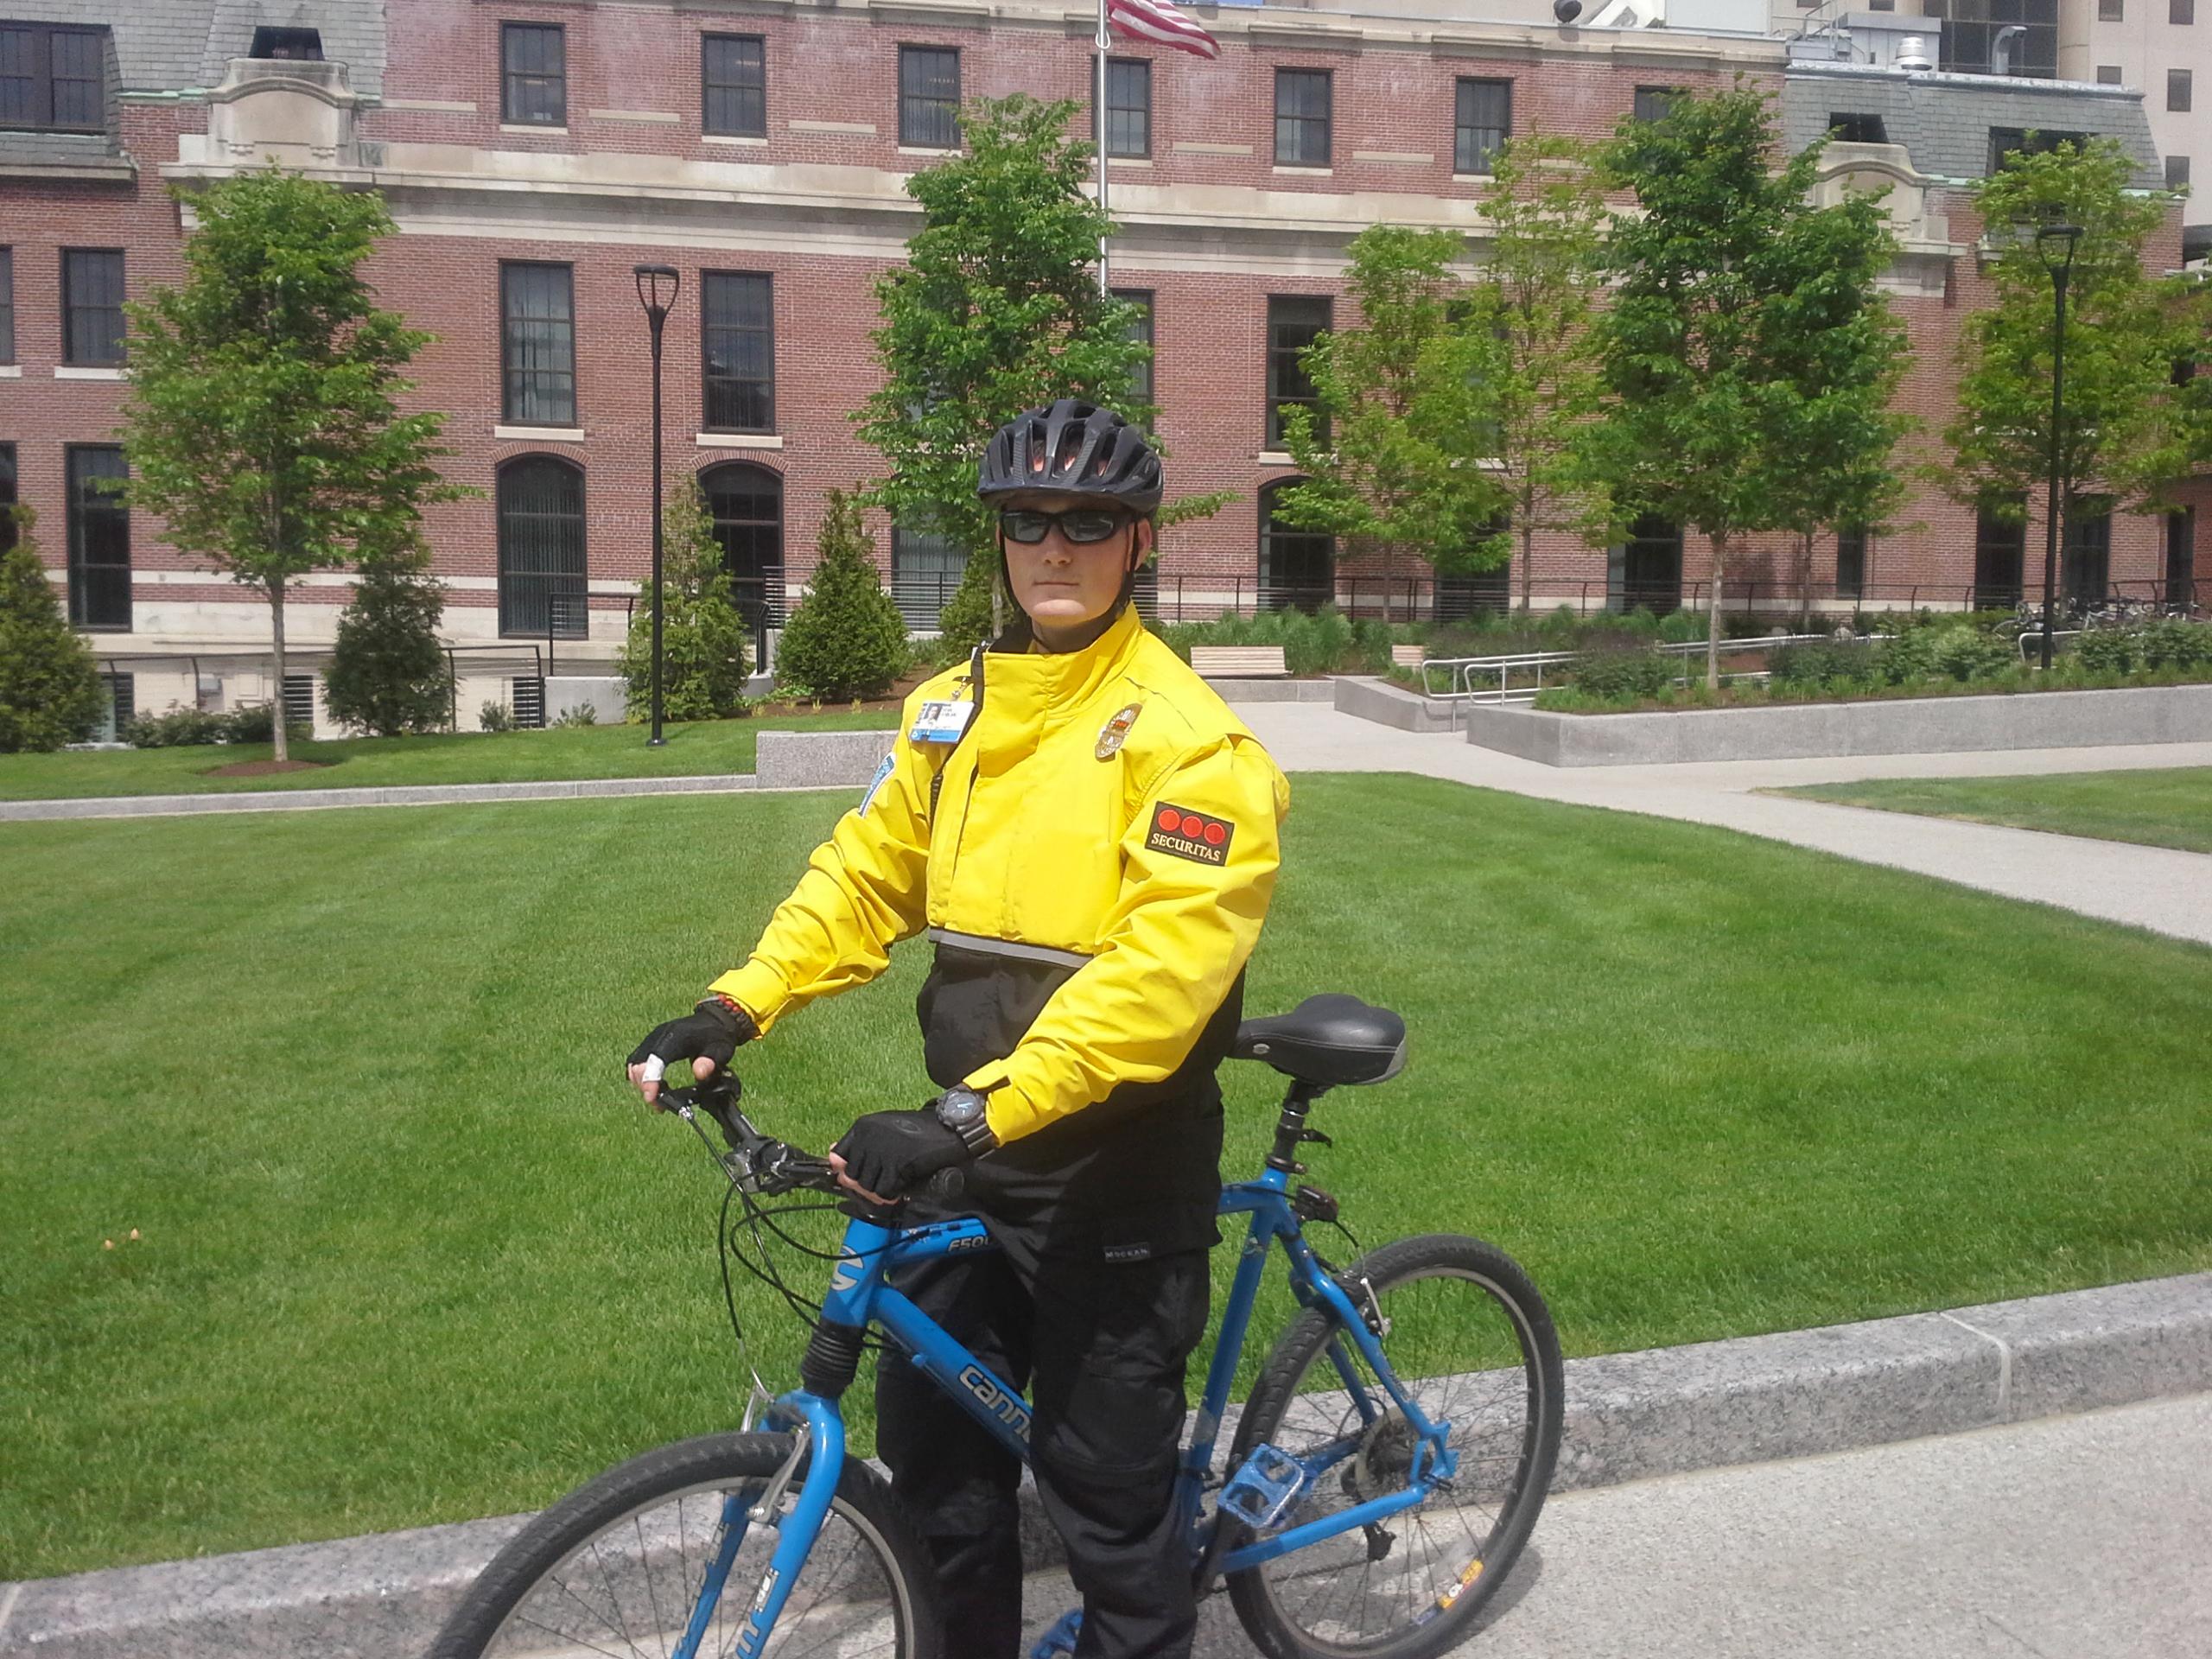 Security officer Sean Doolan